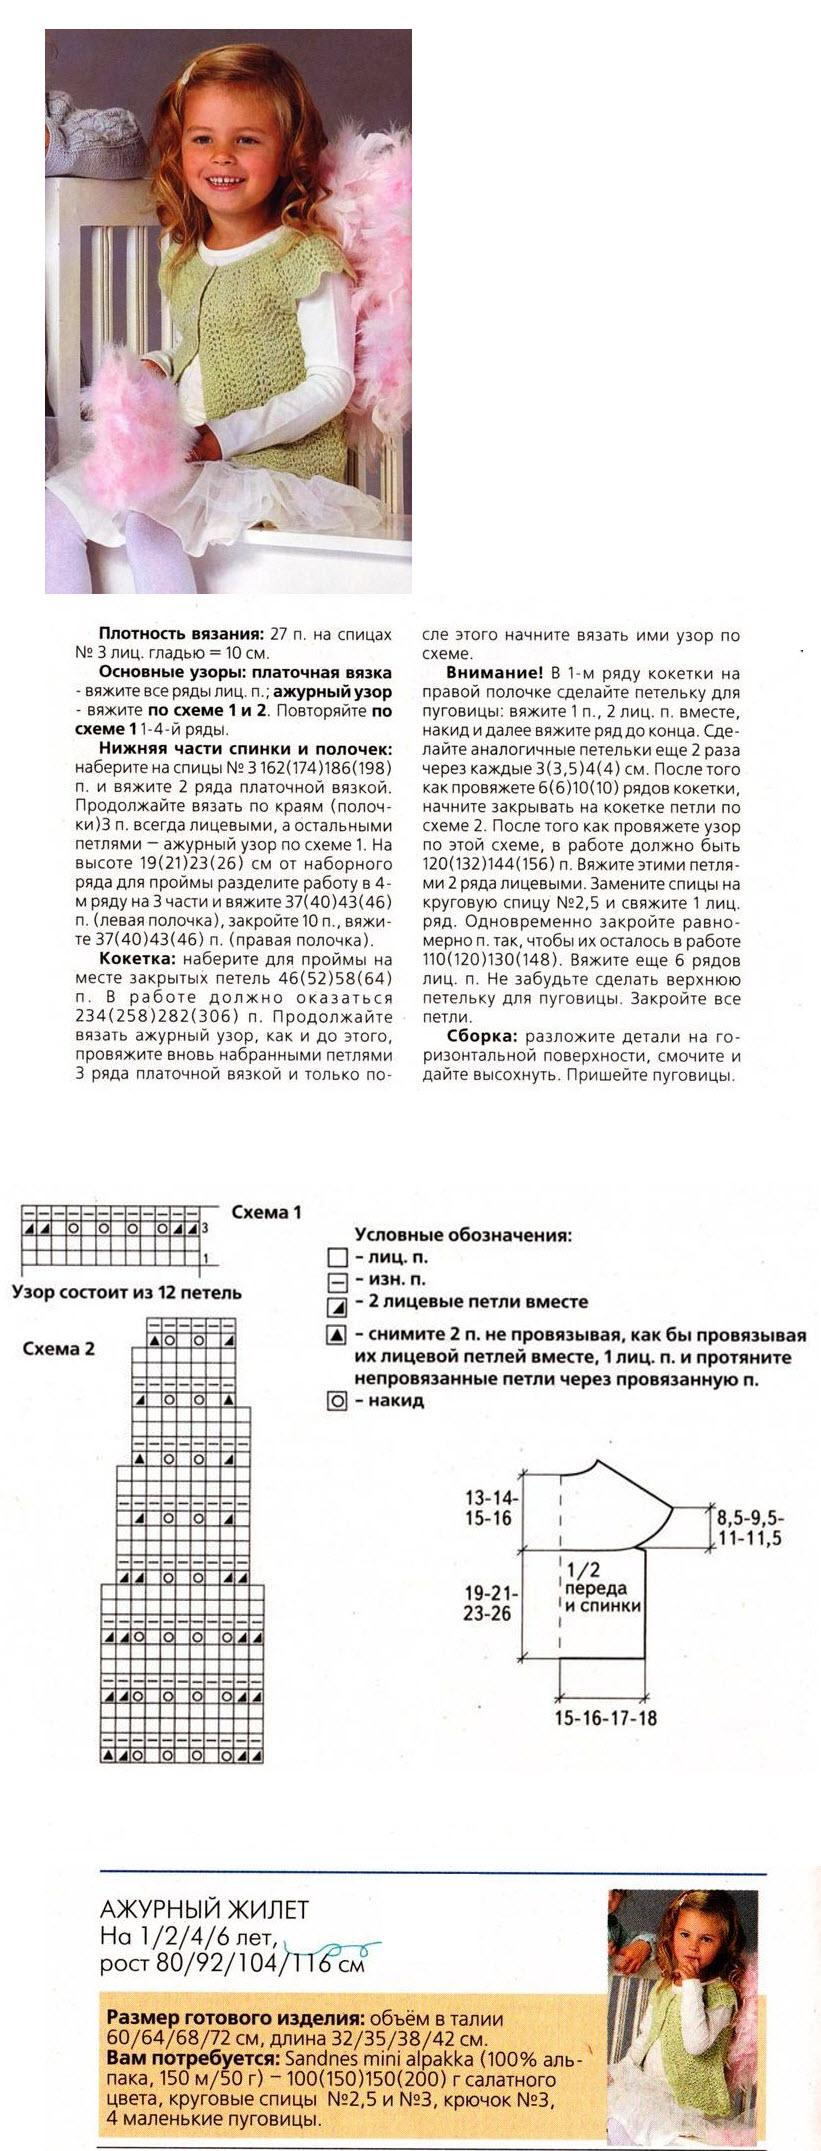 zhiletka dlya devochki spicami 3 - Вязаный жилет для девочки спицами схемы и описание